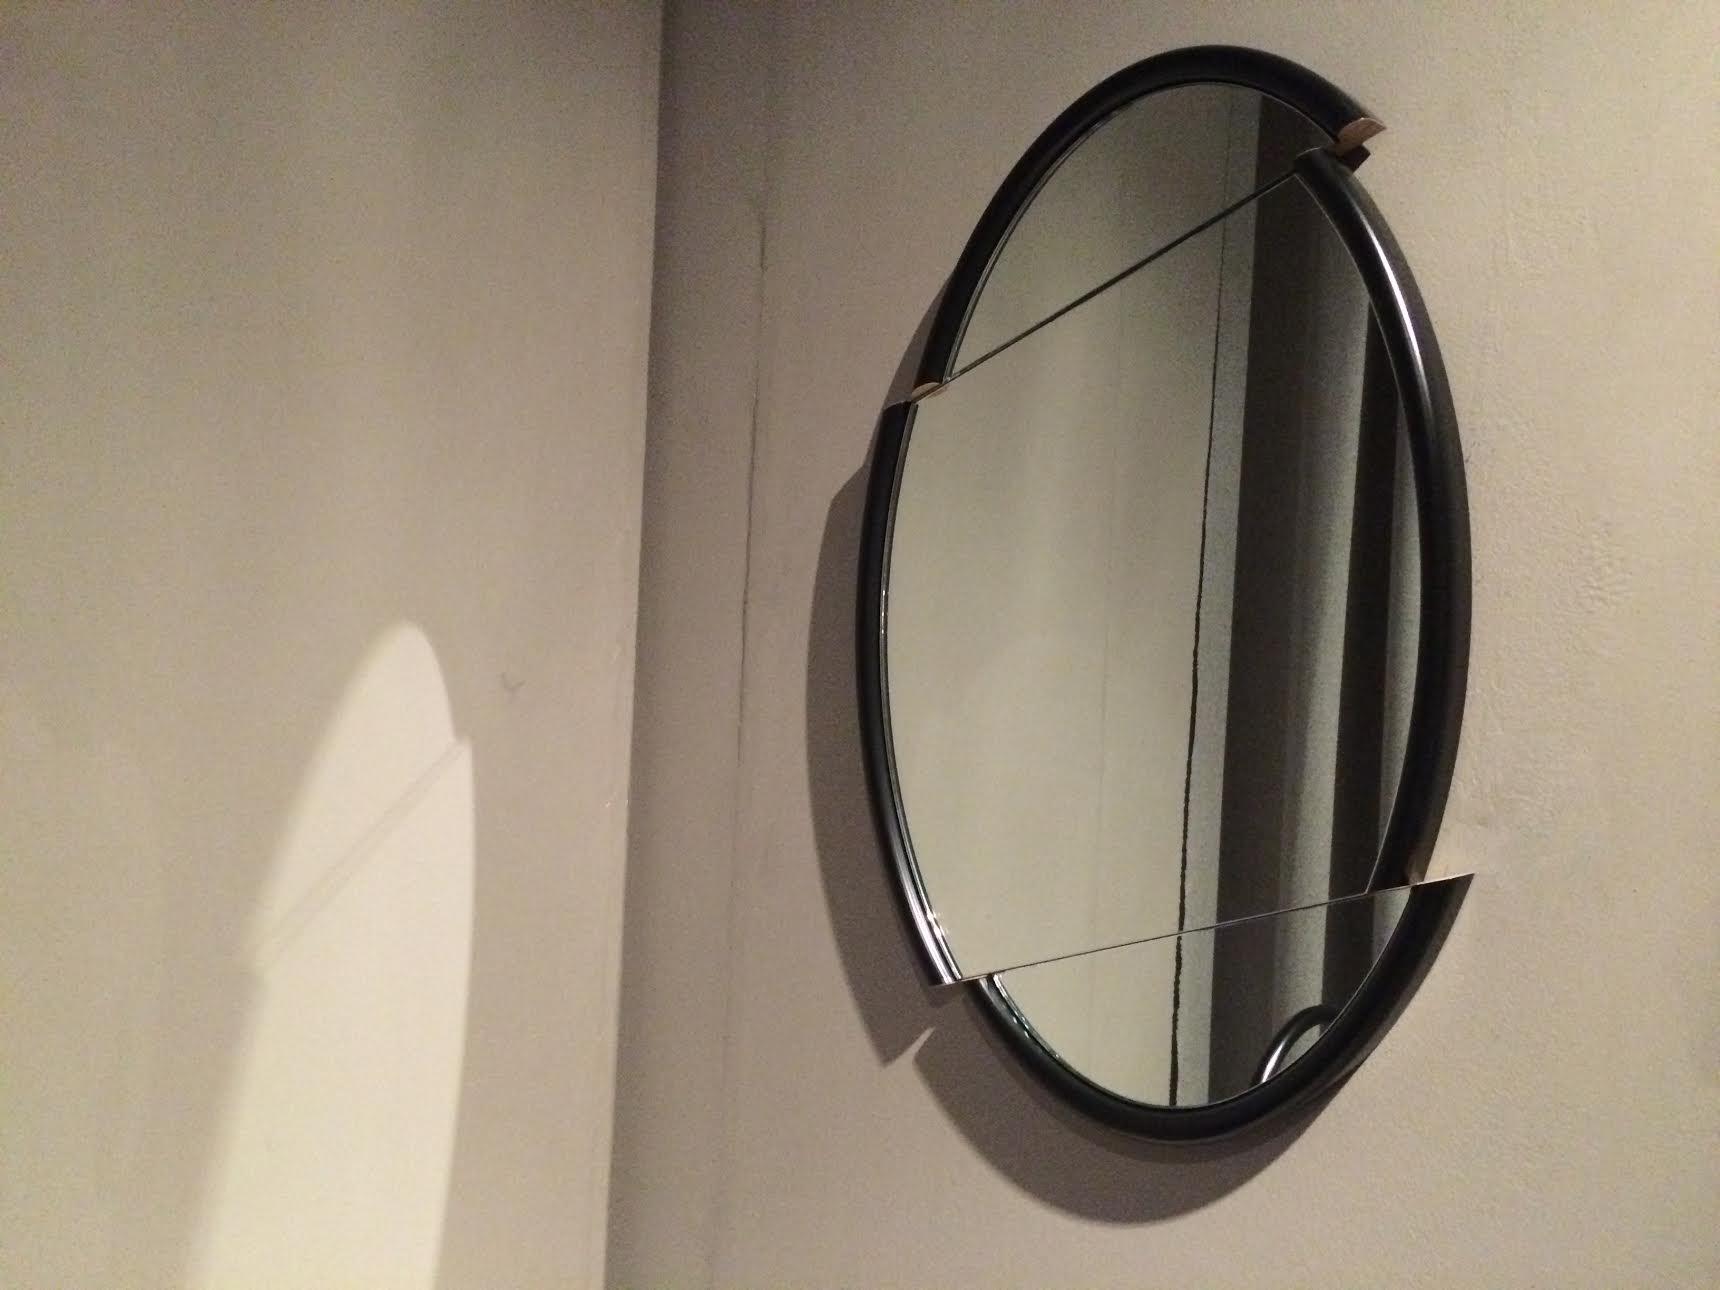 Lee Broom / Split mirror